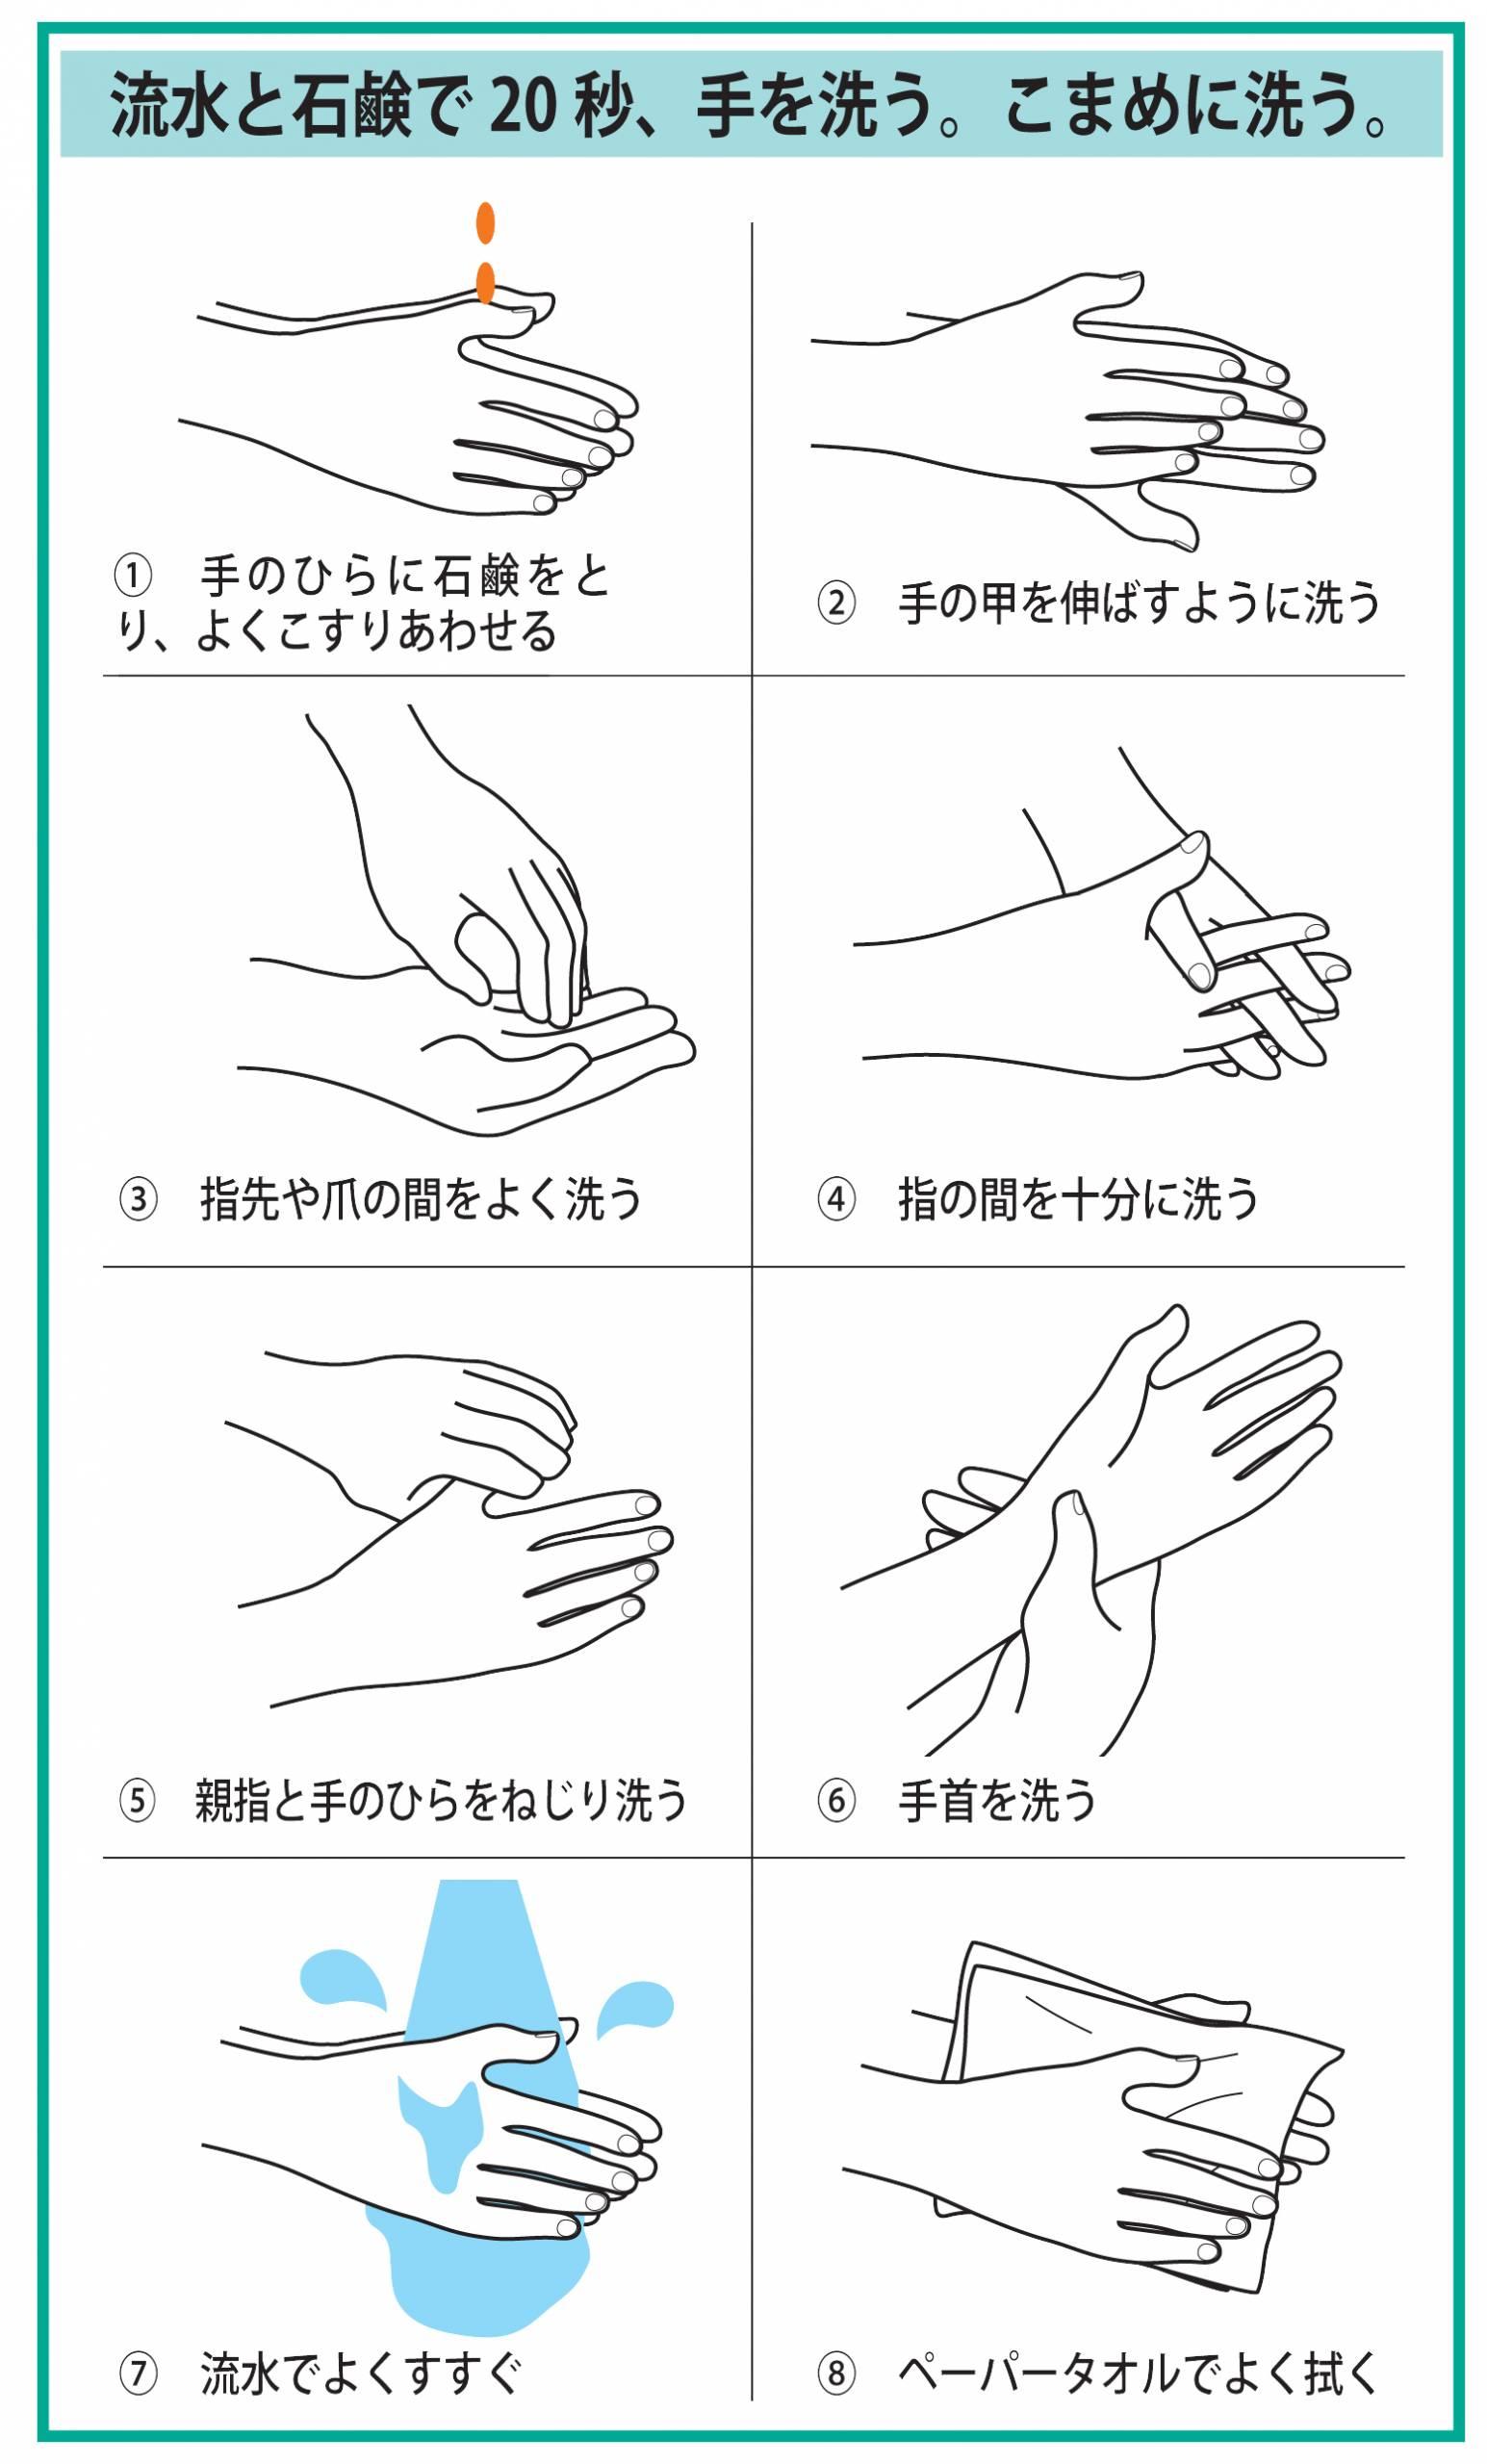 Handwashing procedure